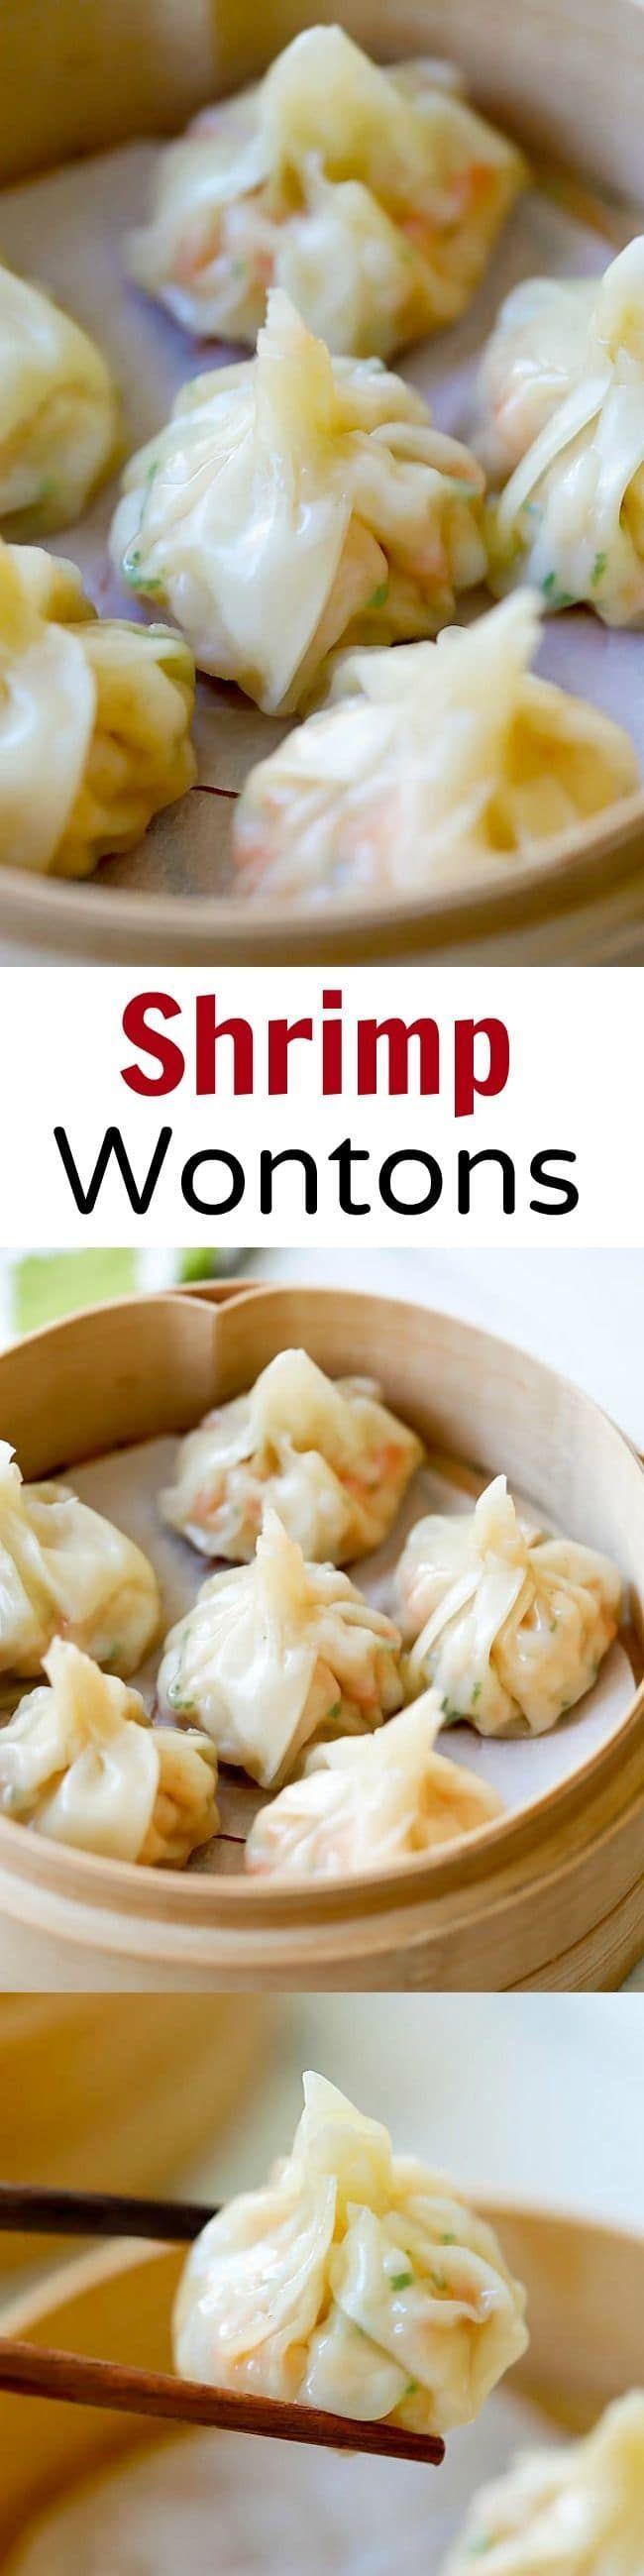 Shrimp wontons – easy peasy shrimp wontons recipe with shrimp, wrapped with wonton skin and boil/steam. SO easy & delicious!!! | rasamalaysia.com